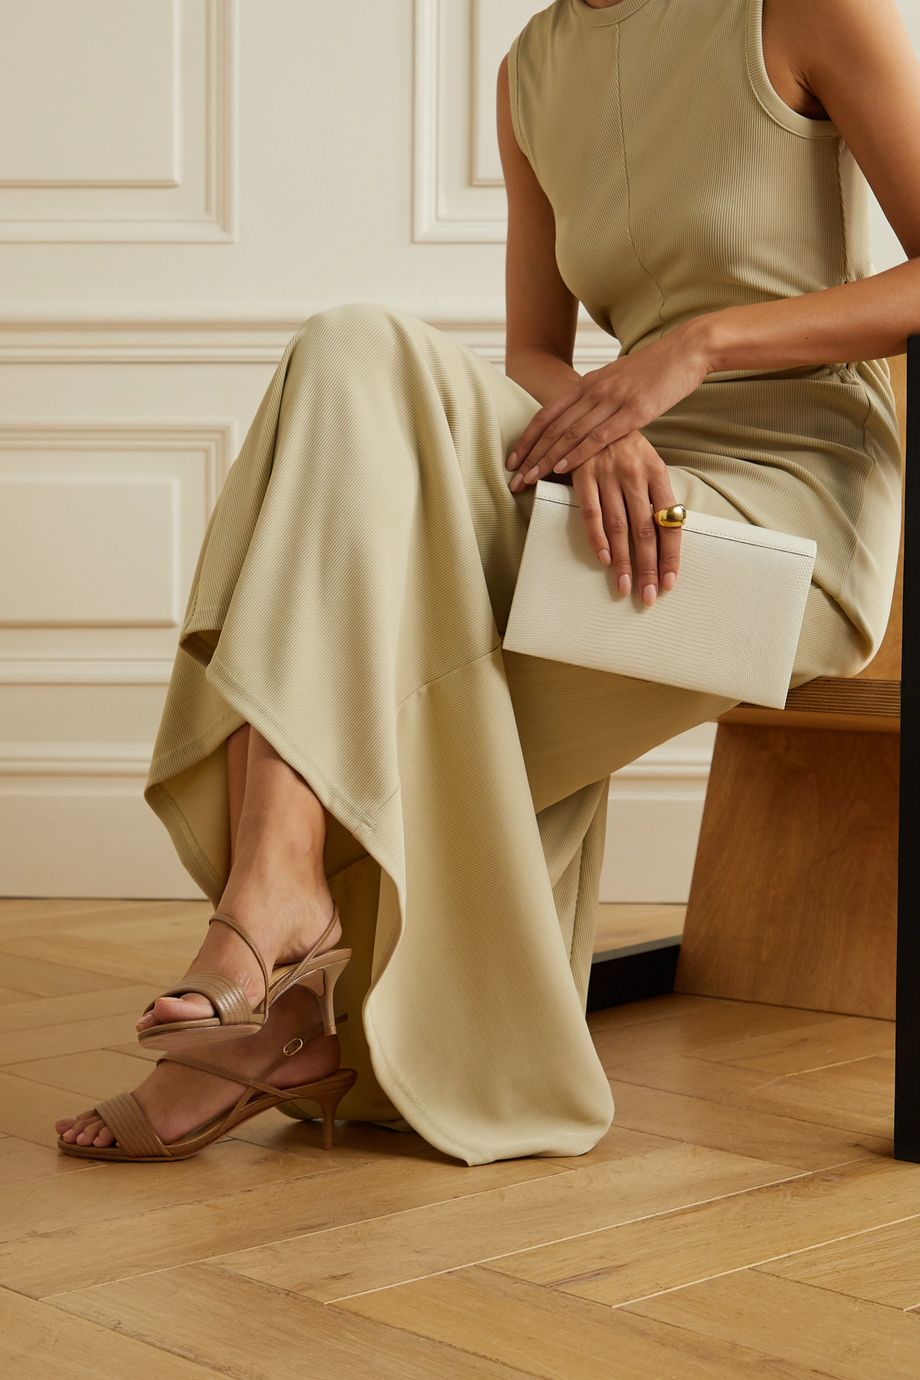 Alexandre Birman Veronica leather sandals